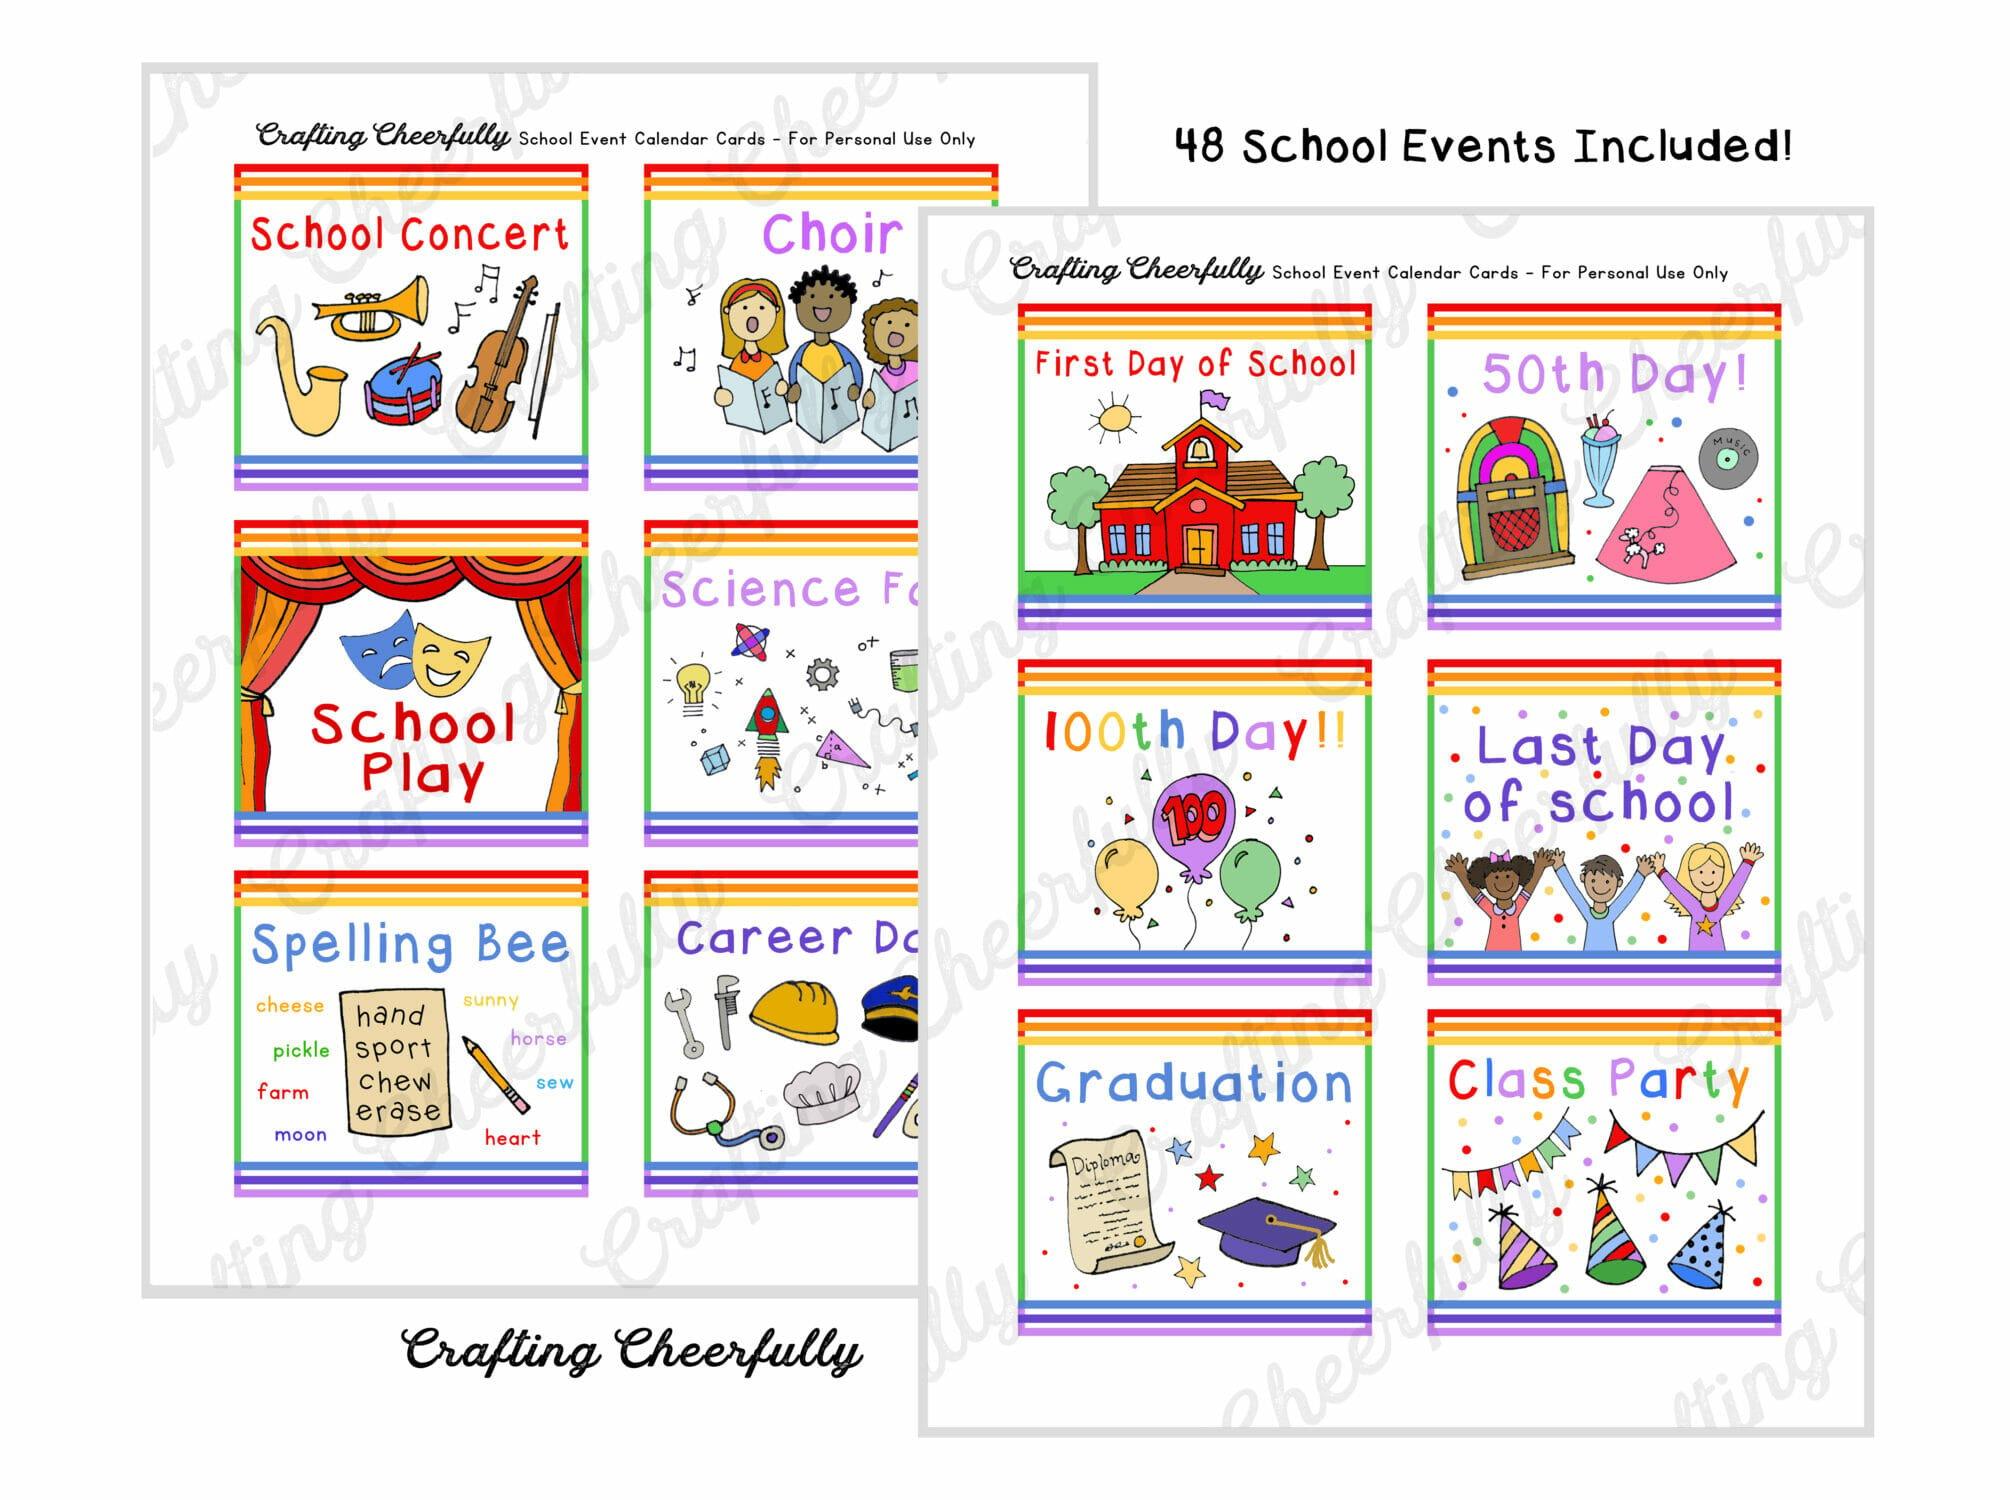 School Event Calendar Cards